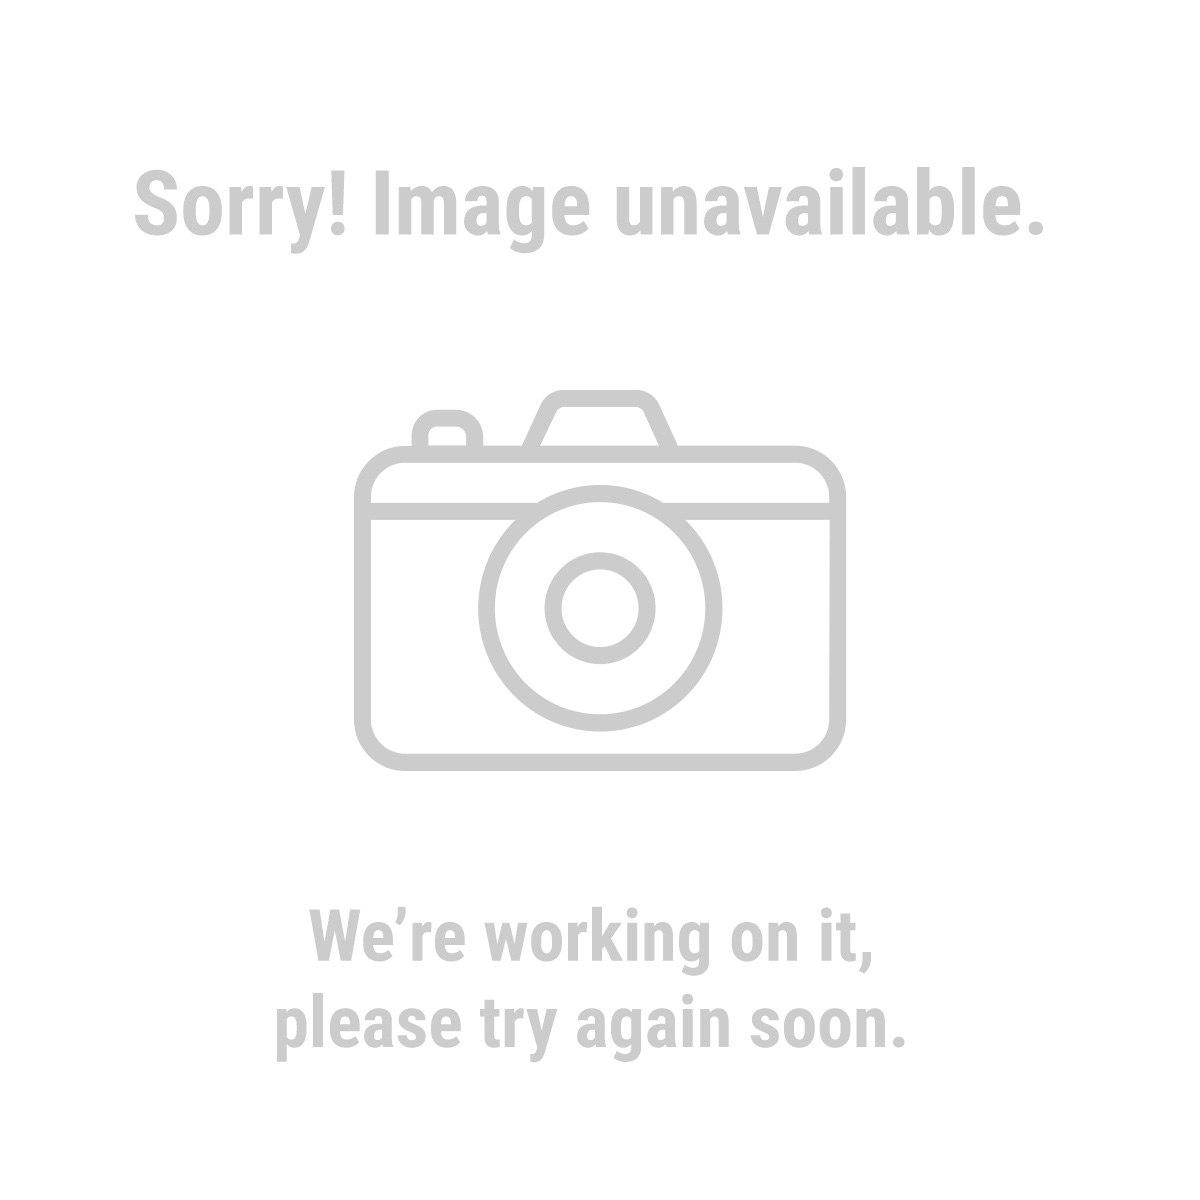 Haul-Master 69338 1 Ton Chain Hoist